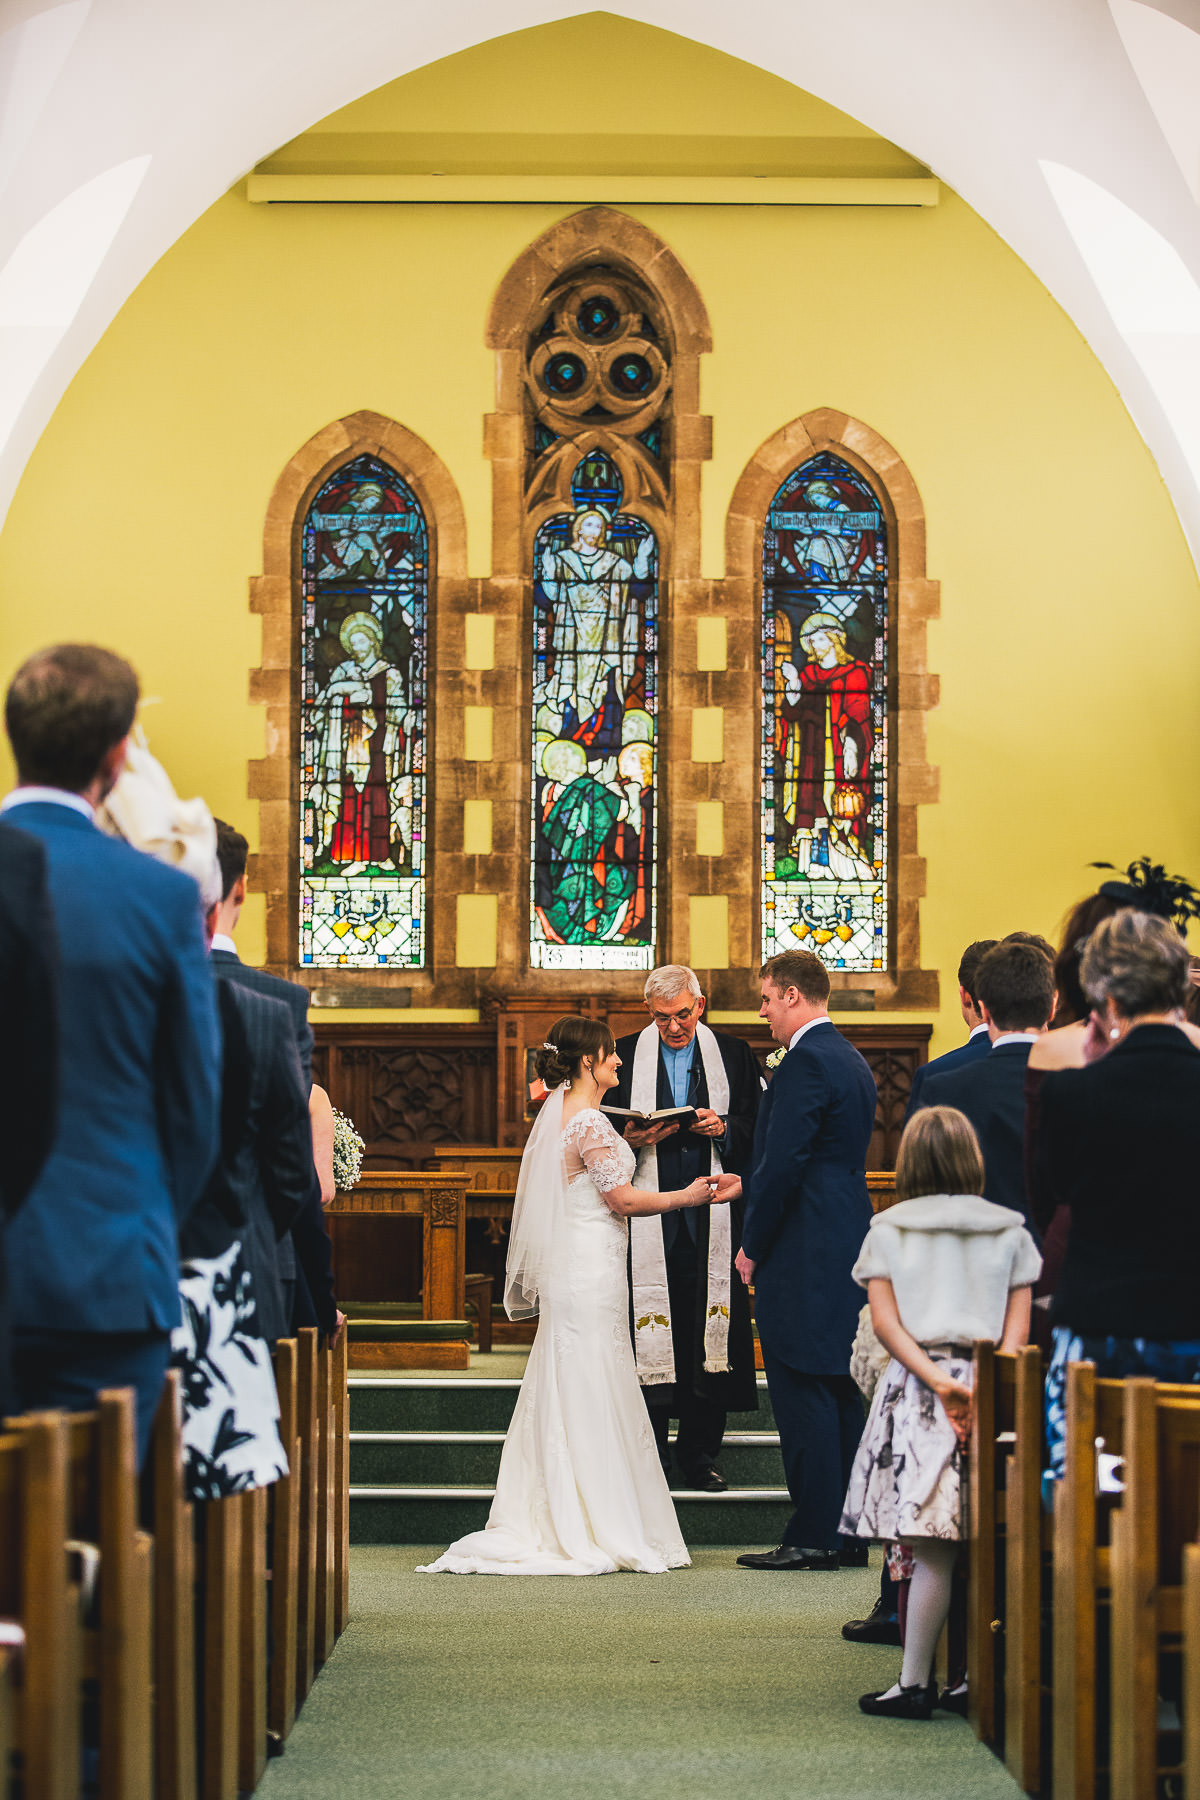 028 - Shustoke Barns Wedding Photographer - Hannah and Andrew